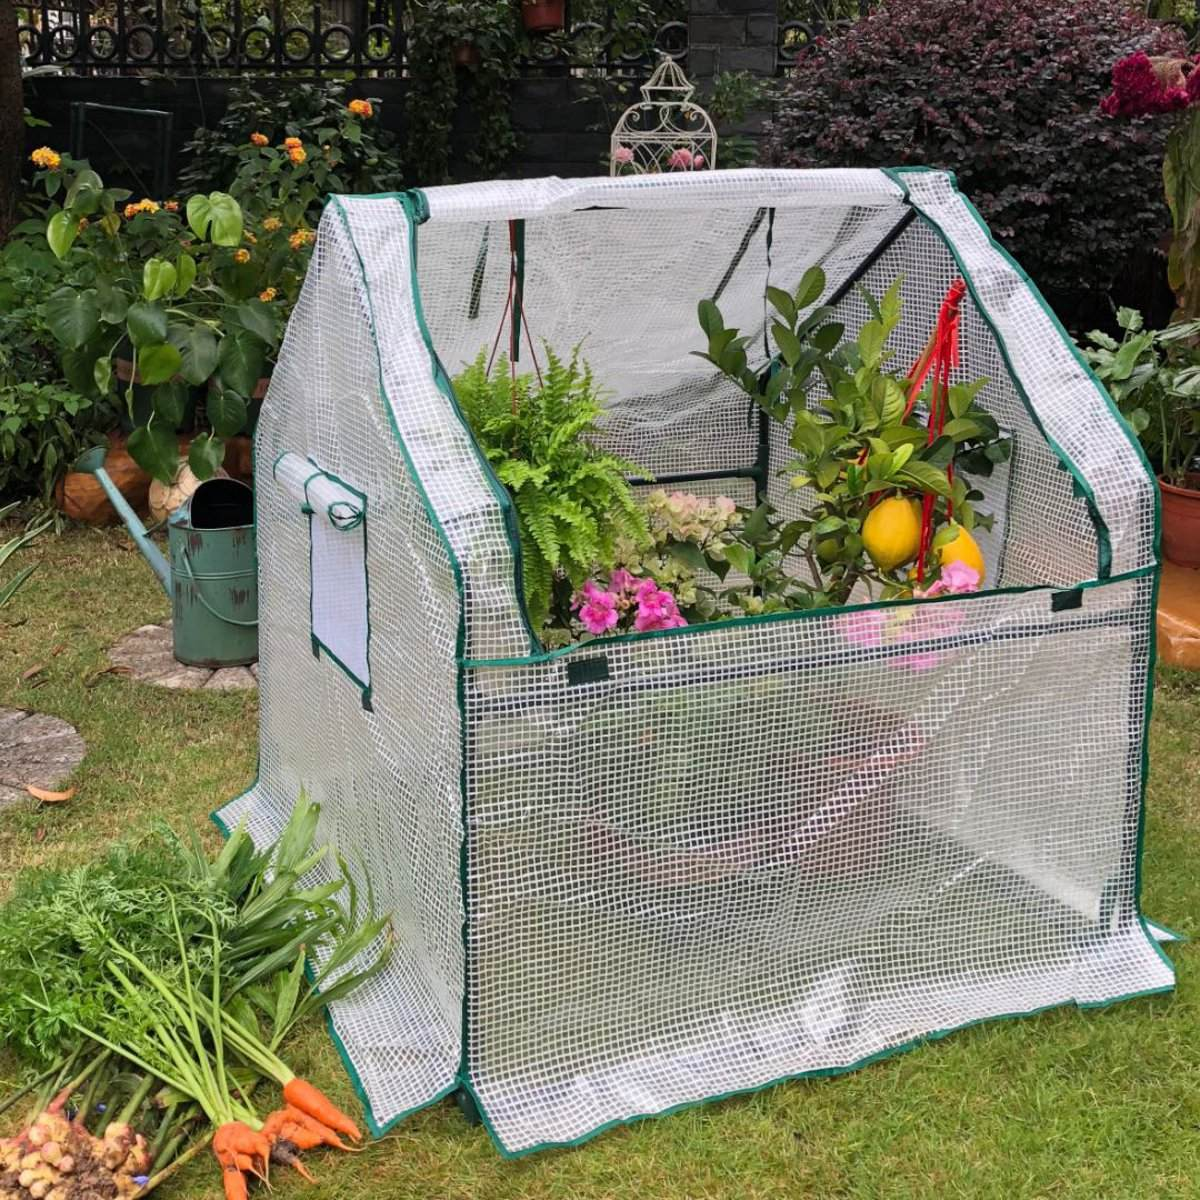 90x90x90cm Mini Greenhouse Home Outdoor Flowers Plants Gardening Room Winter Warm Shelter Shade Balcony Garden Greenhouse Kit